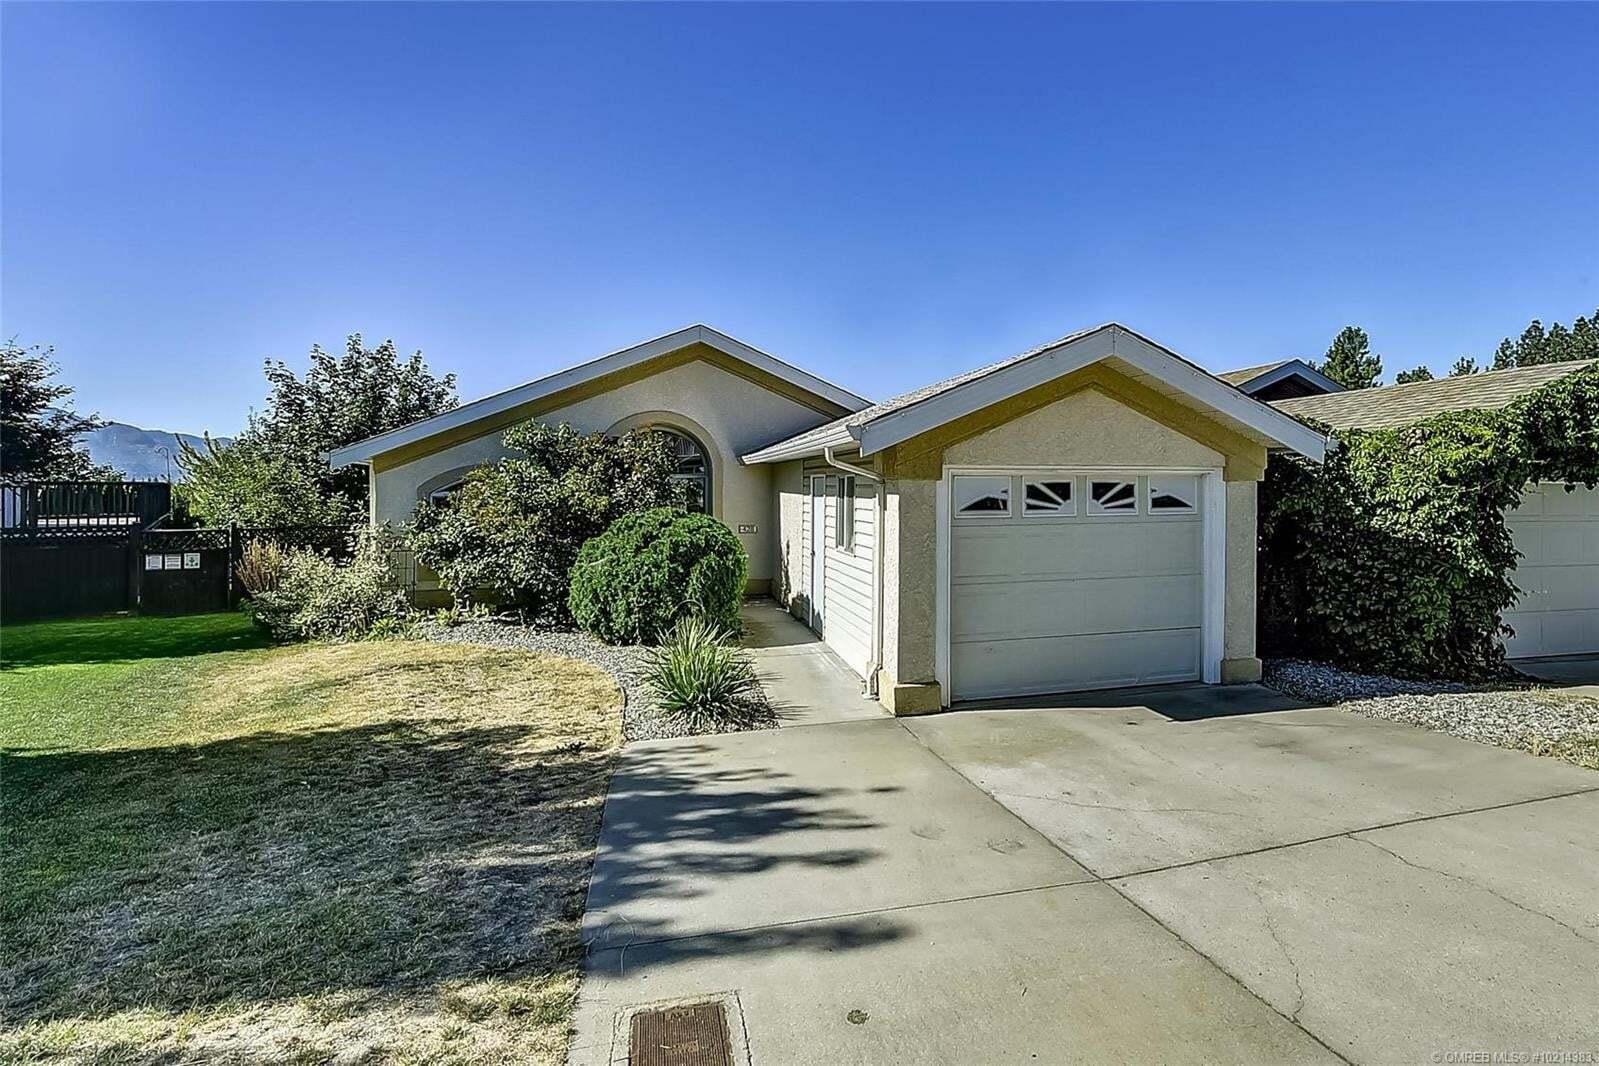 House for sale at 2440 Old Okanagan Hy Unit 428 West Kelowna British Columbia - MLS: 10214383